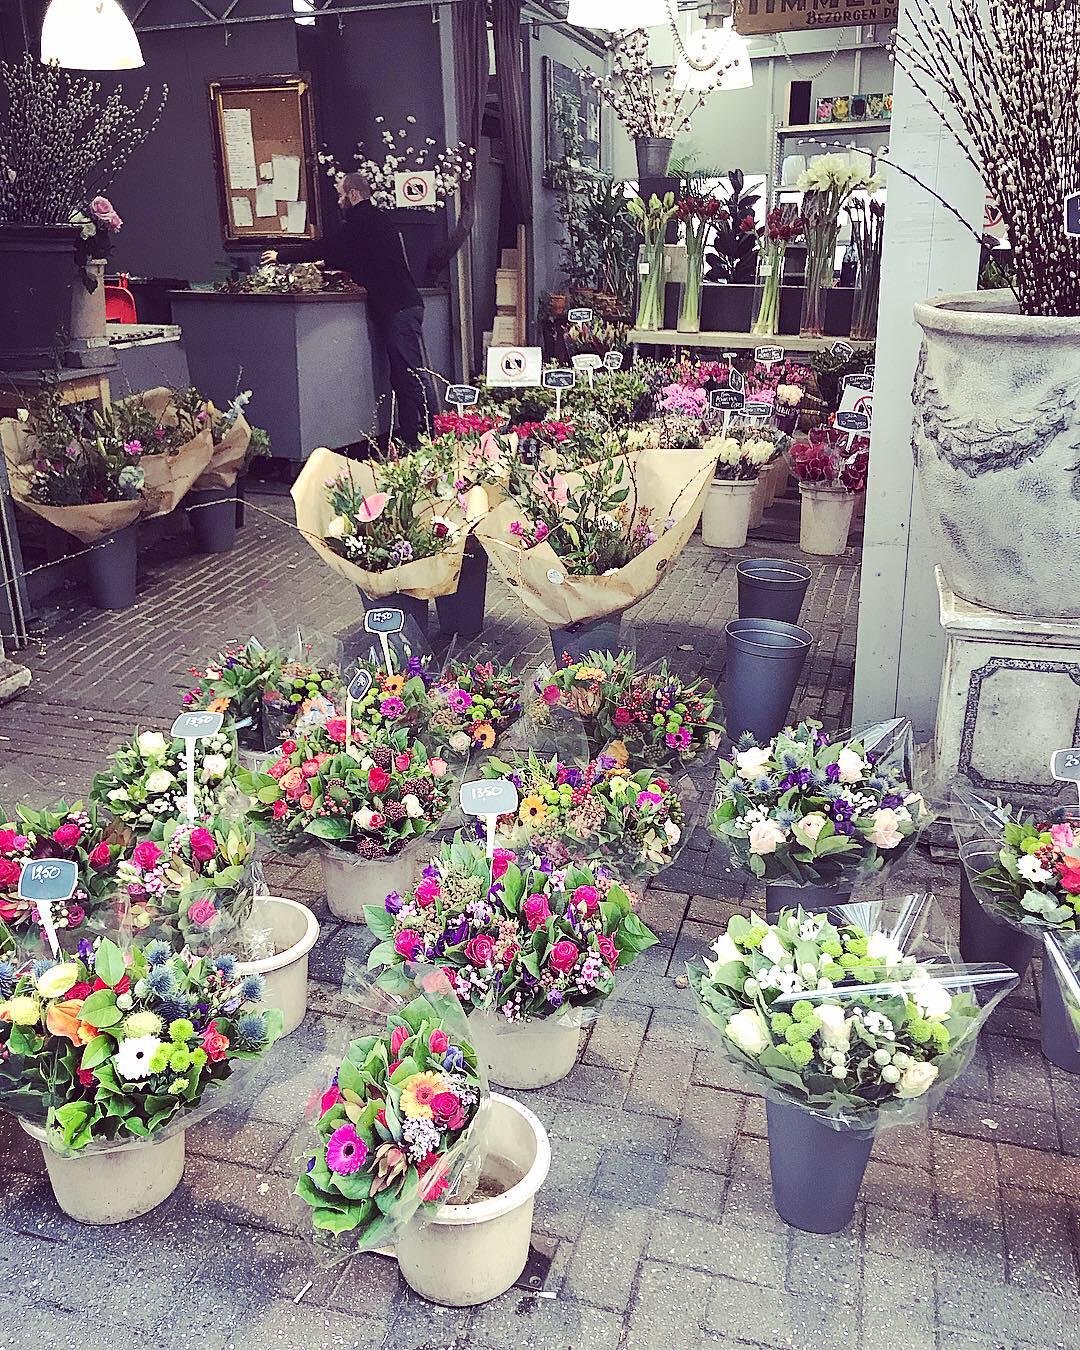 Bloemenmarkt: The Flower Floating Market